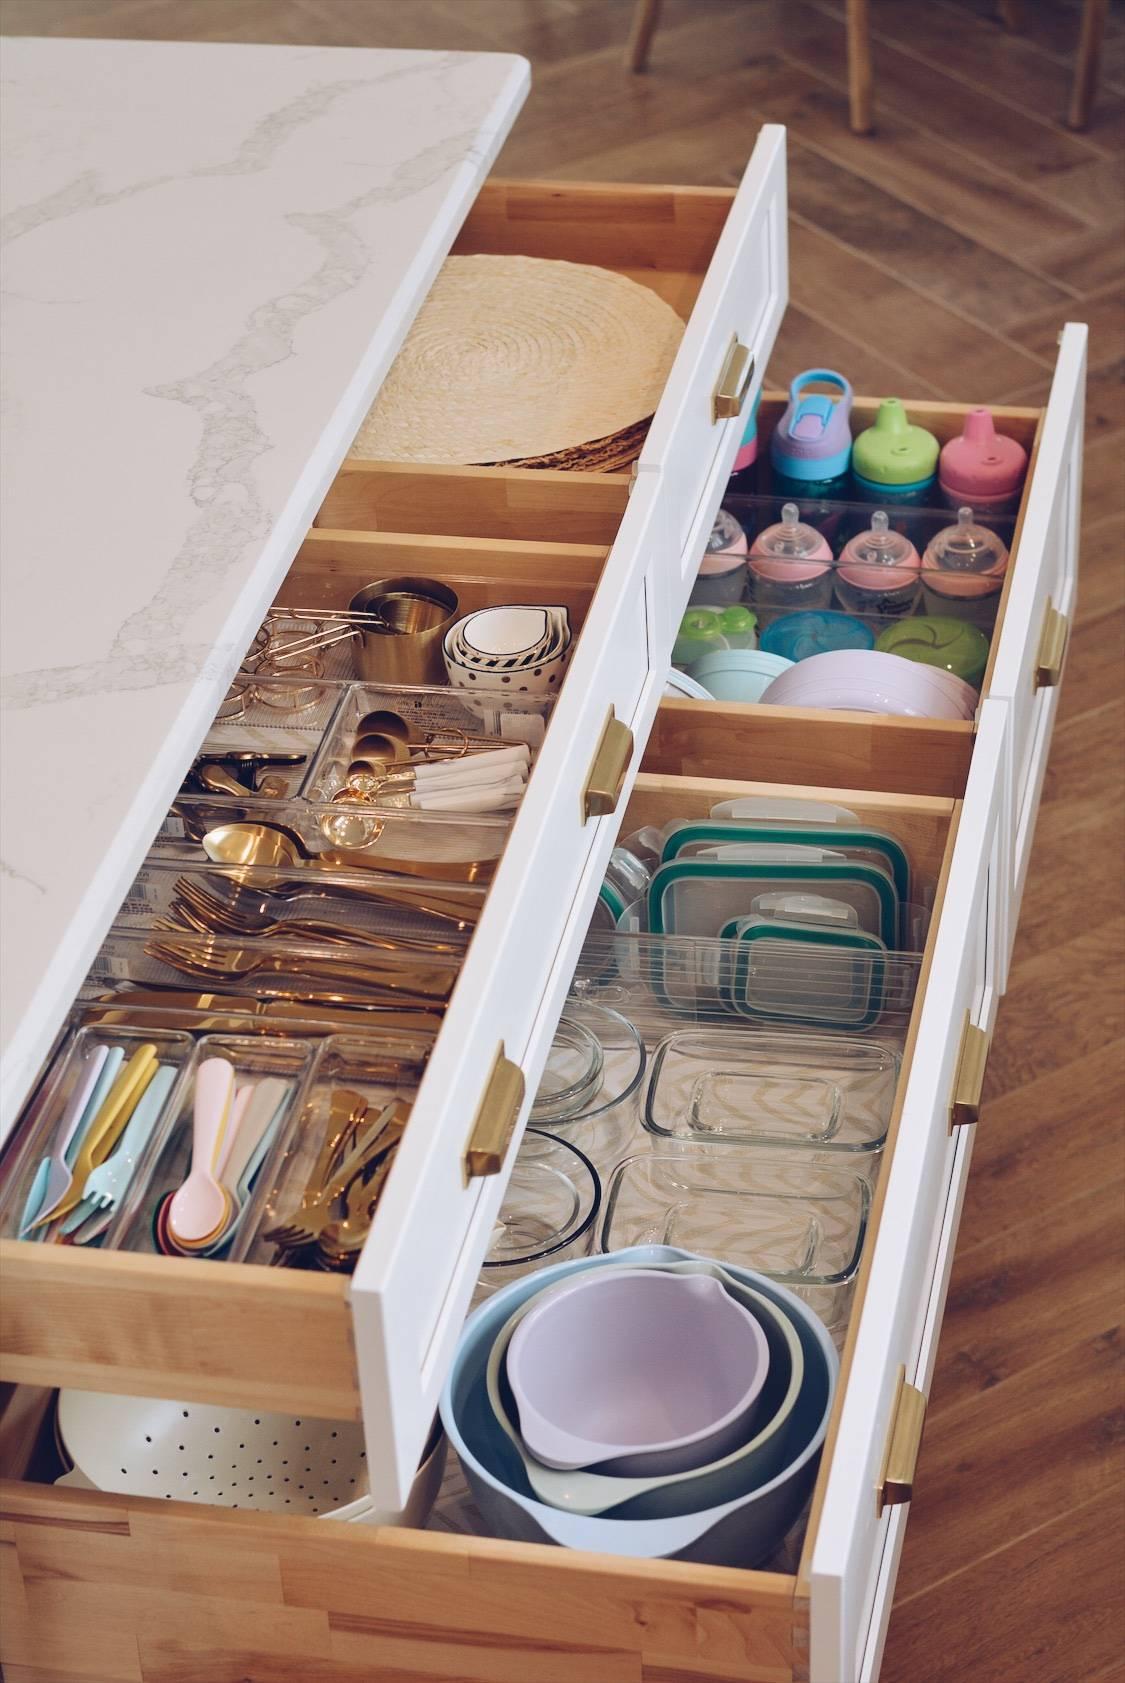 Kitchen Organization: How To Organize Your Kitchen Drawers